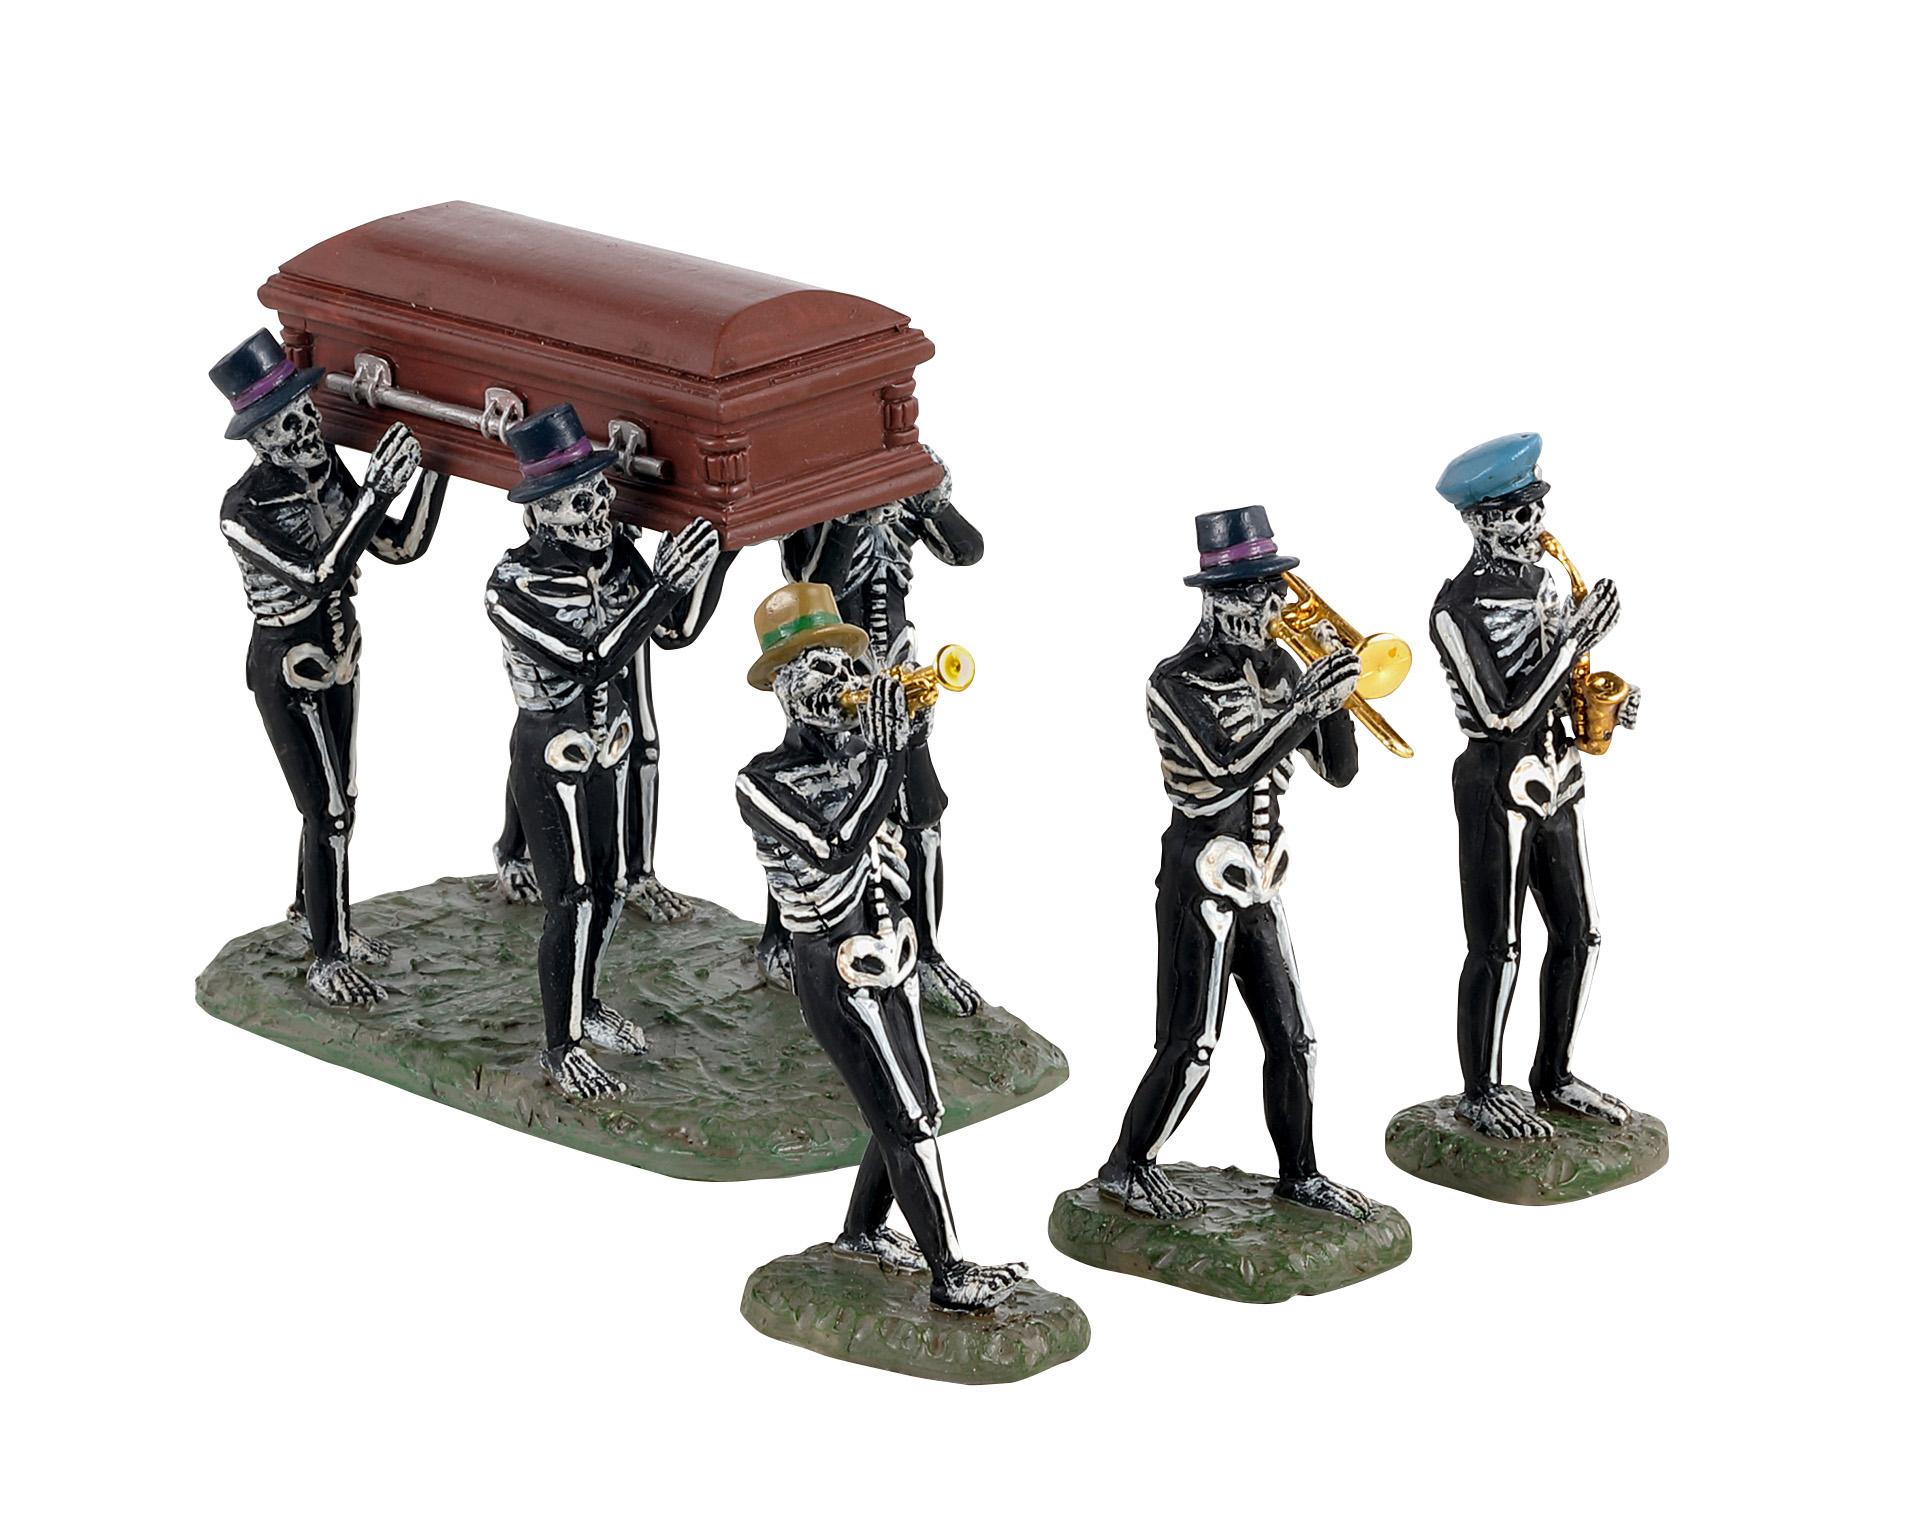 Jazz funeral, set of 4